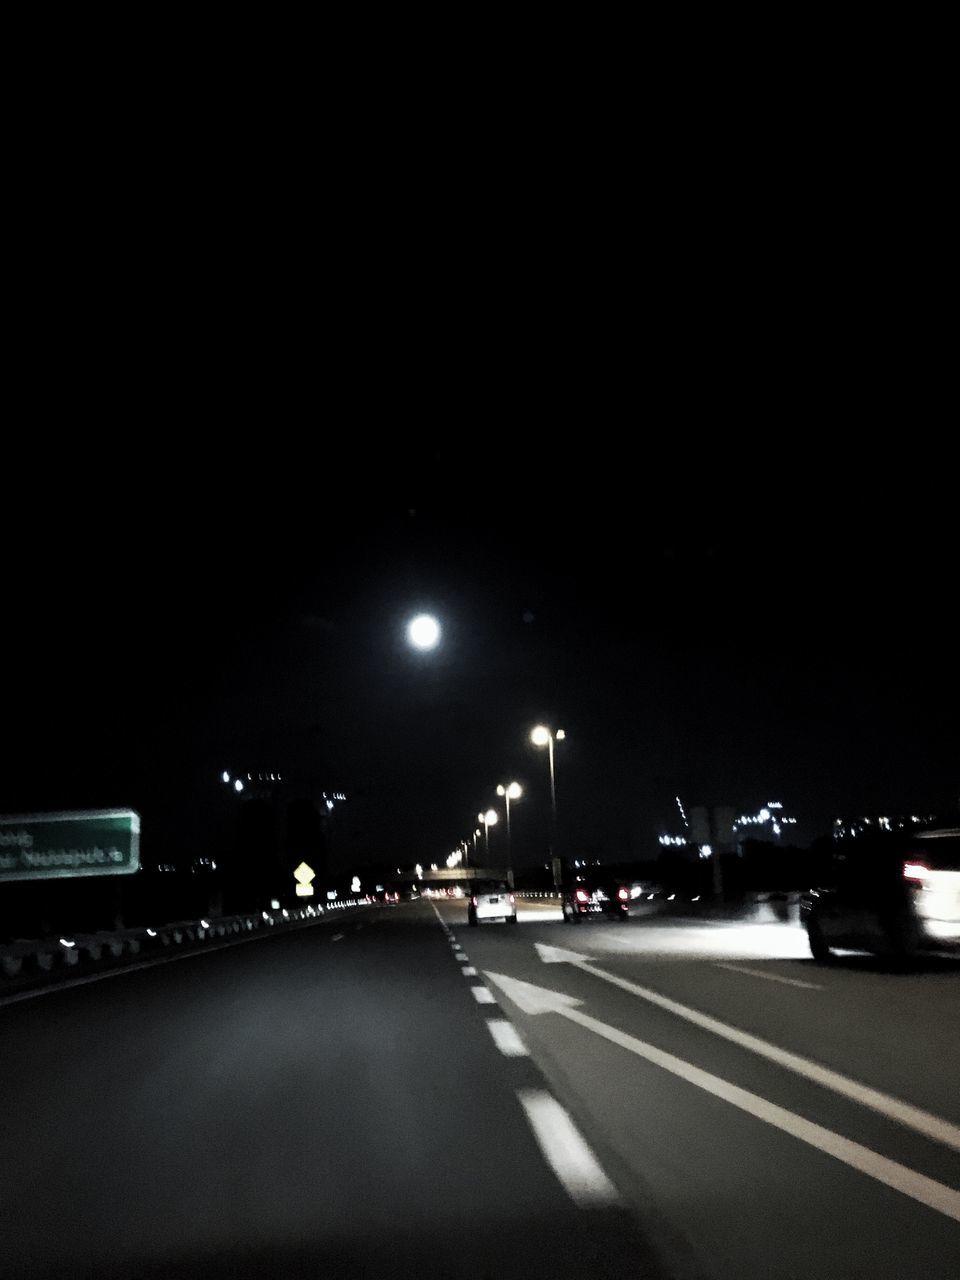 night, car, road, illuminated, transportation, street, city, no people, outdoors